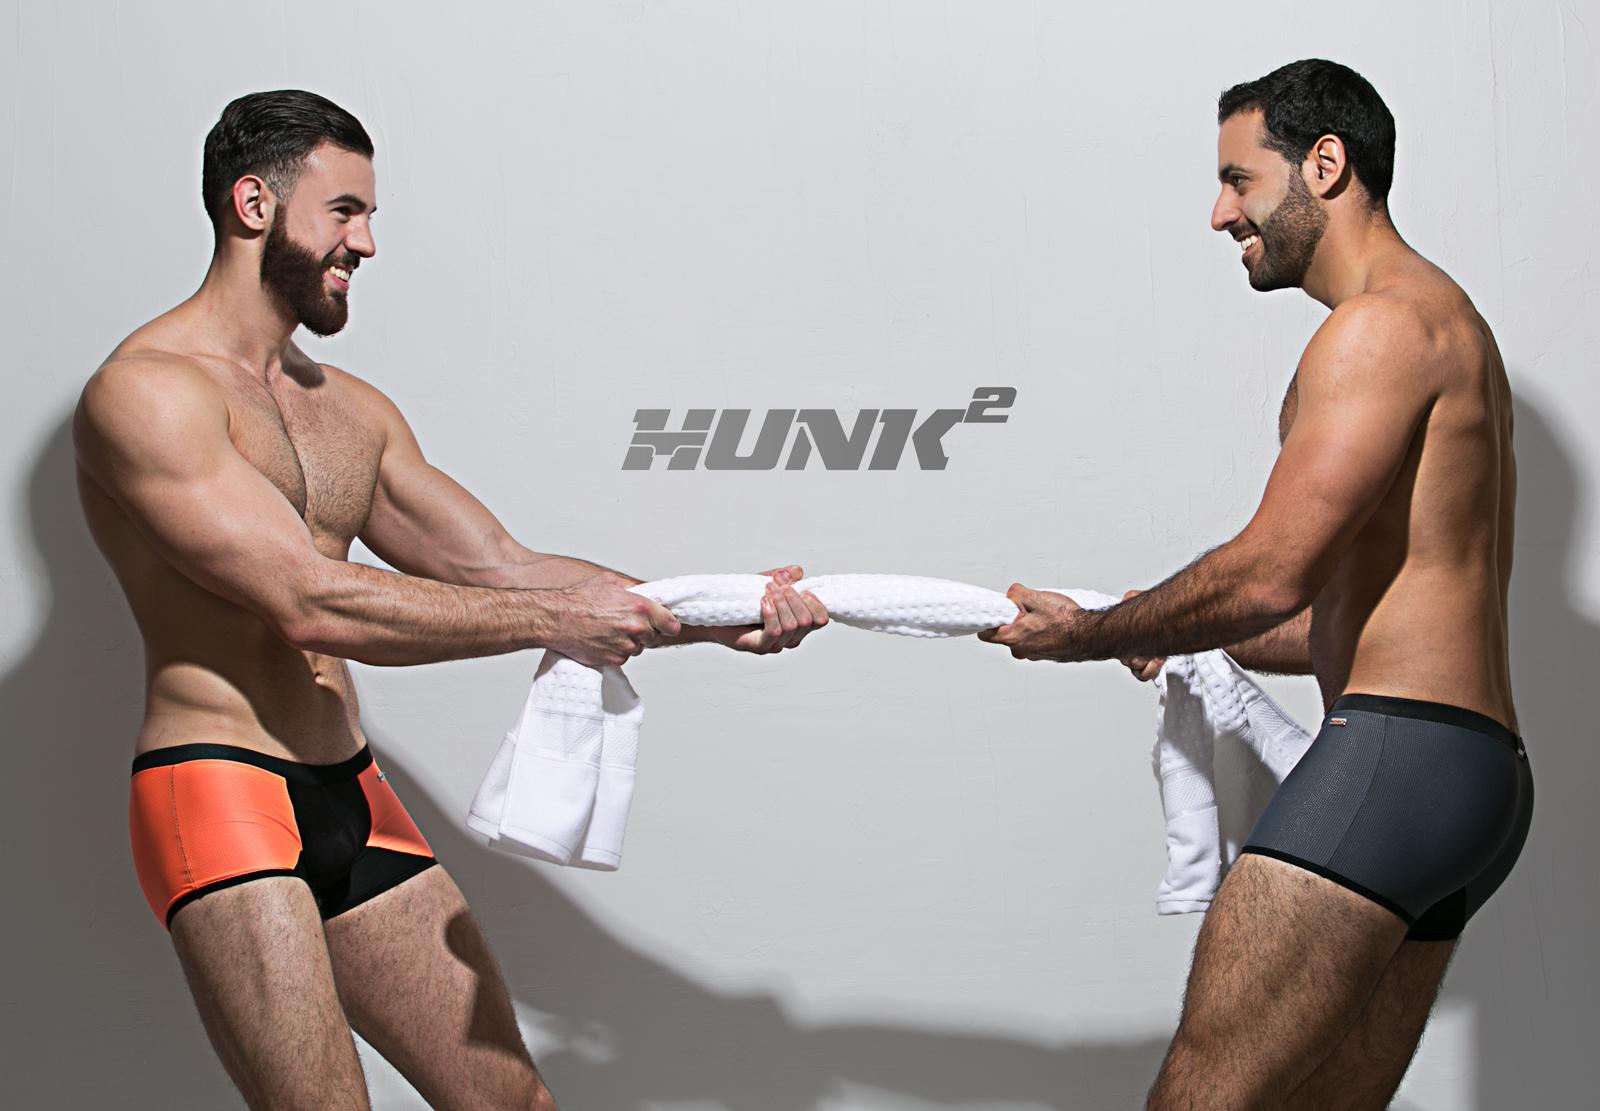 3b1a94bf3bd46c Hunk²: A New Brand Redesigning Men's Fashion Underwear   Newswire